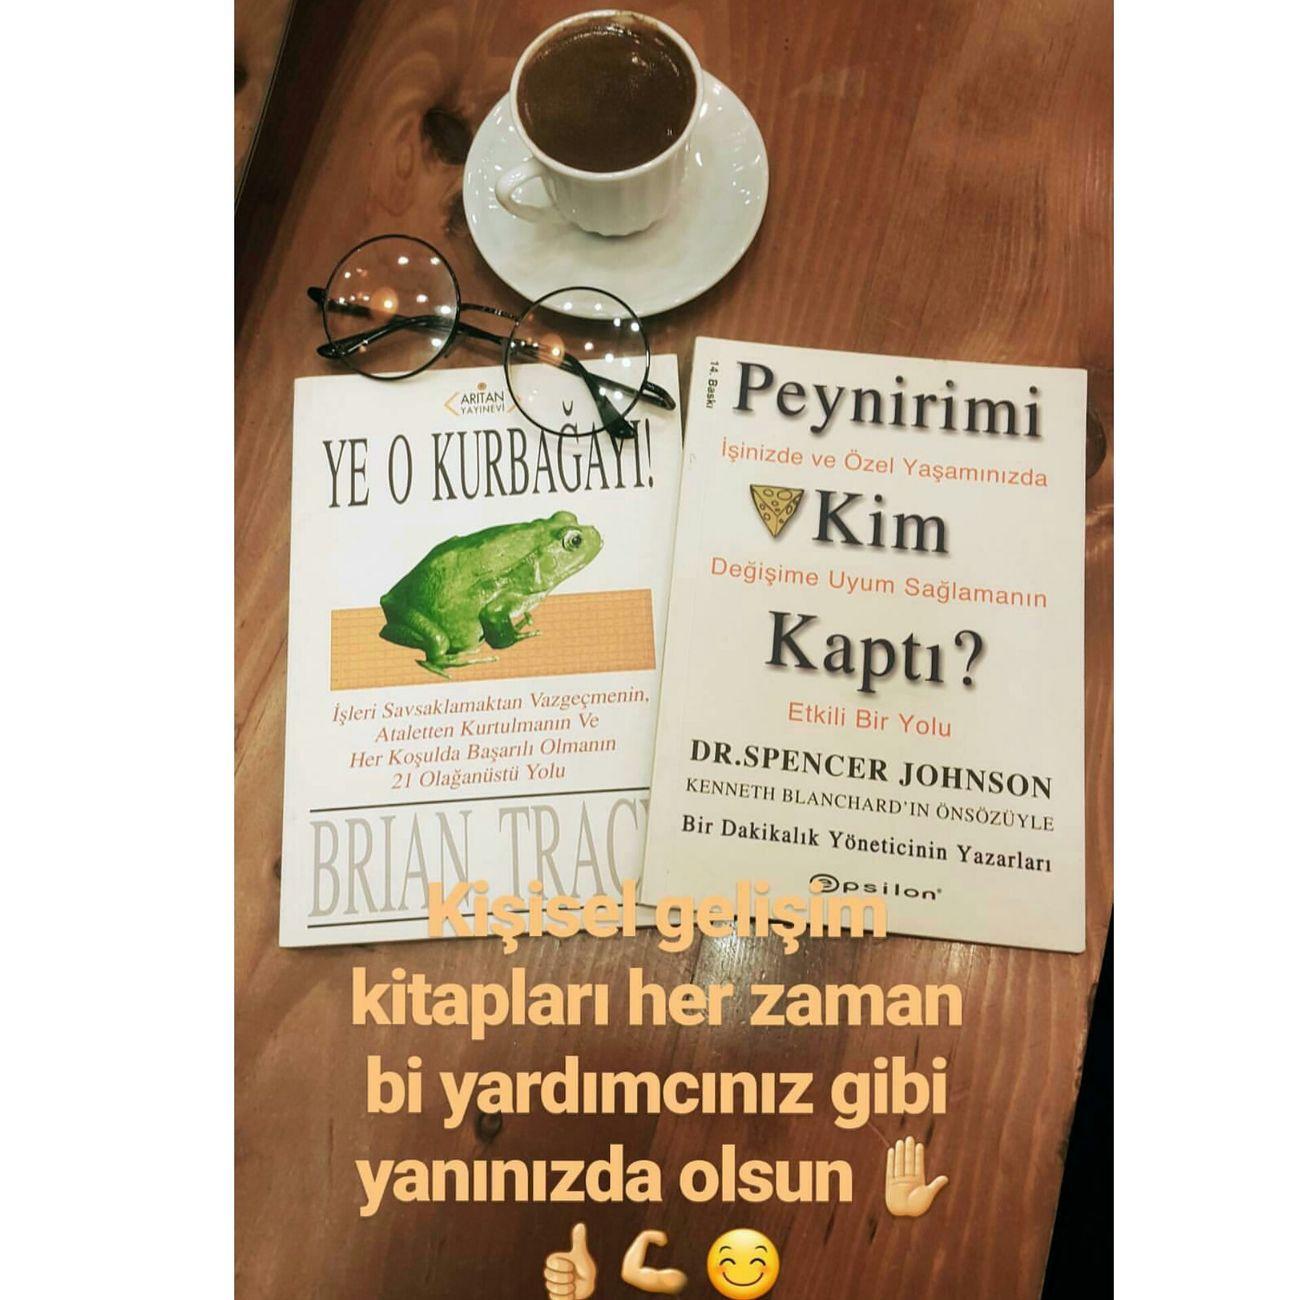 Kitaplariyikivar Kitap Kitapkokusu Coffee ☕ Coffee Huzur Kitapkurdu Kitaplar Türkkahvesi Kahve Hello World